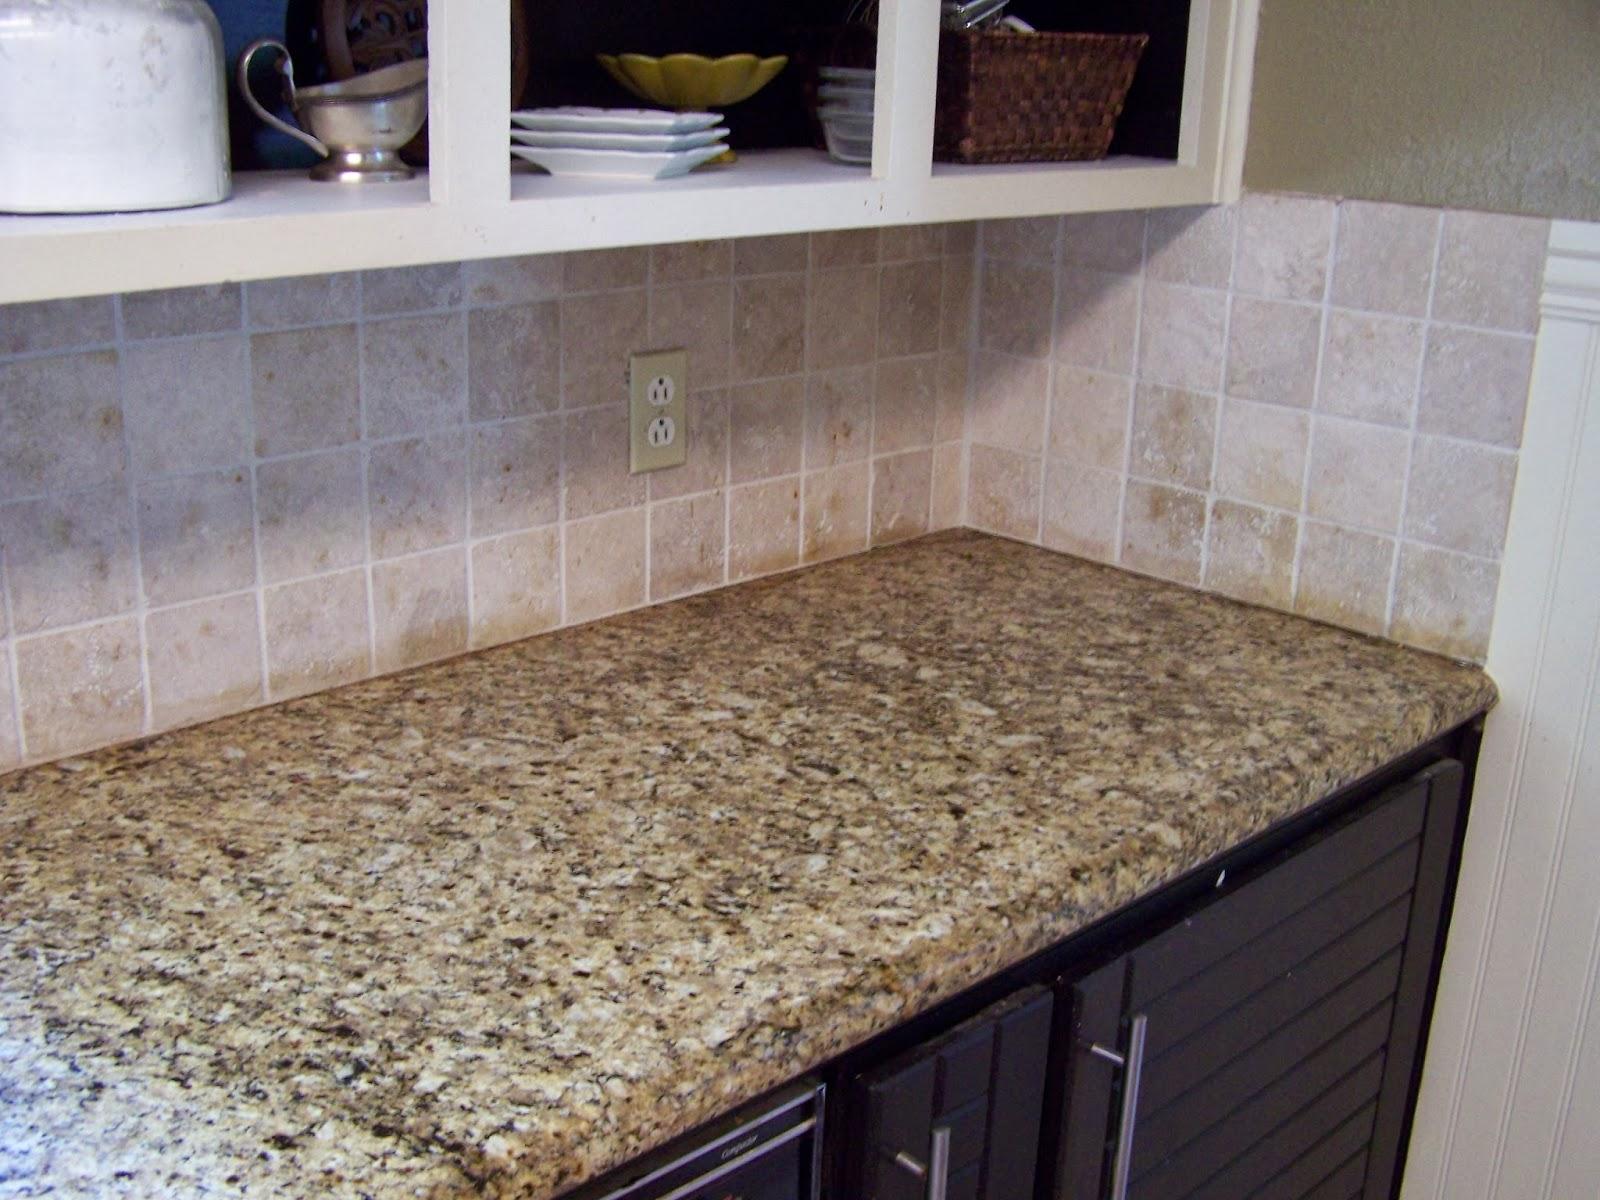 Image Result For Wallpaper That Looks Like Tile For Kitchen Backsplash